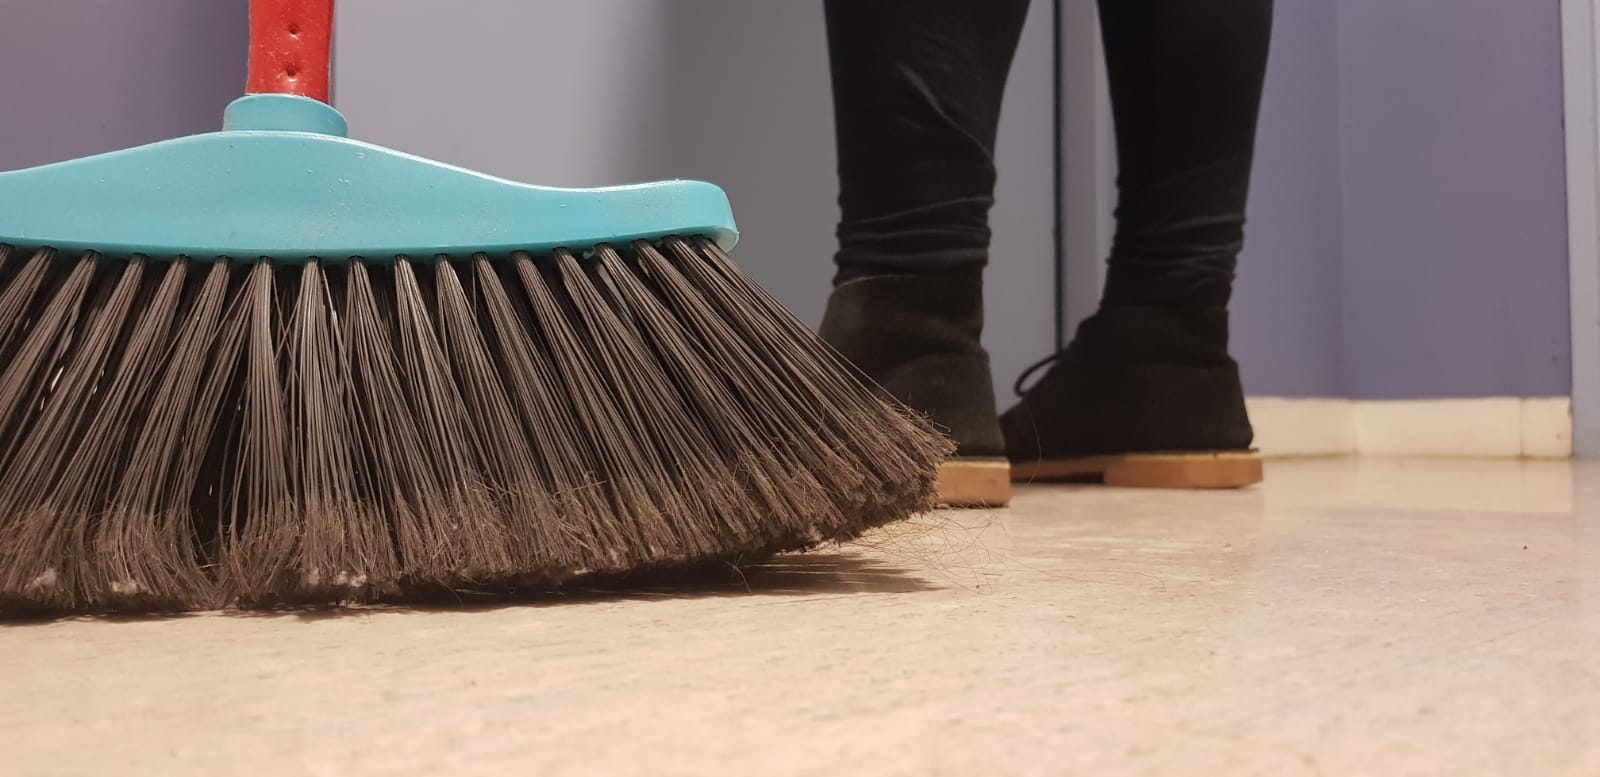 a broom on the floor